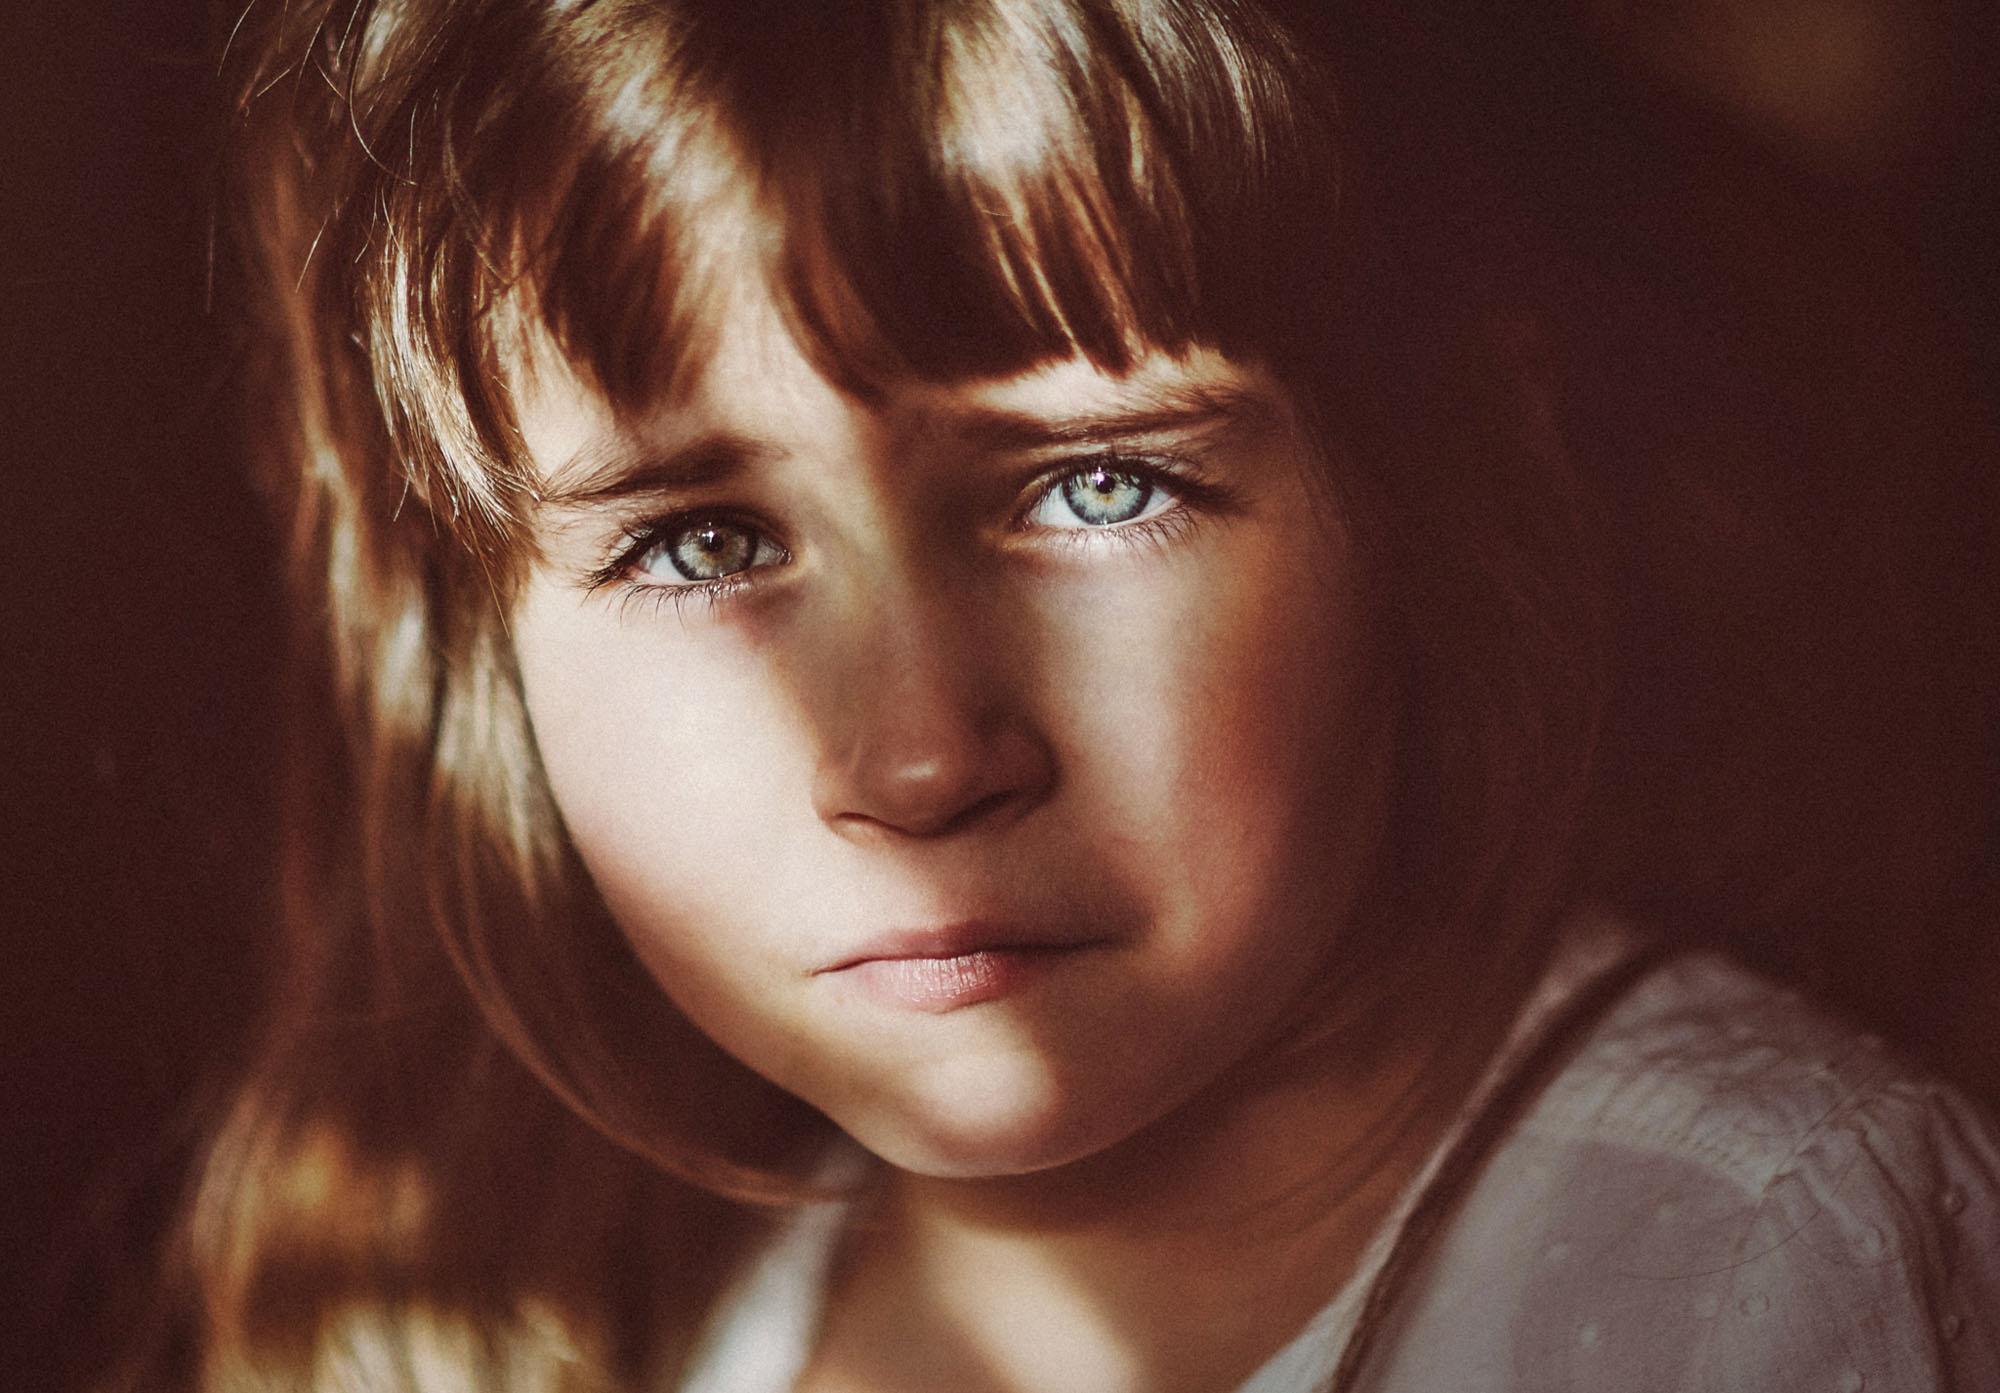 Portraits | World Photography Organisation